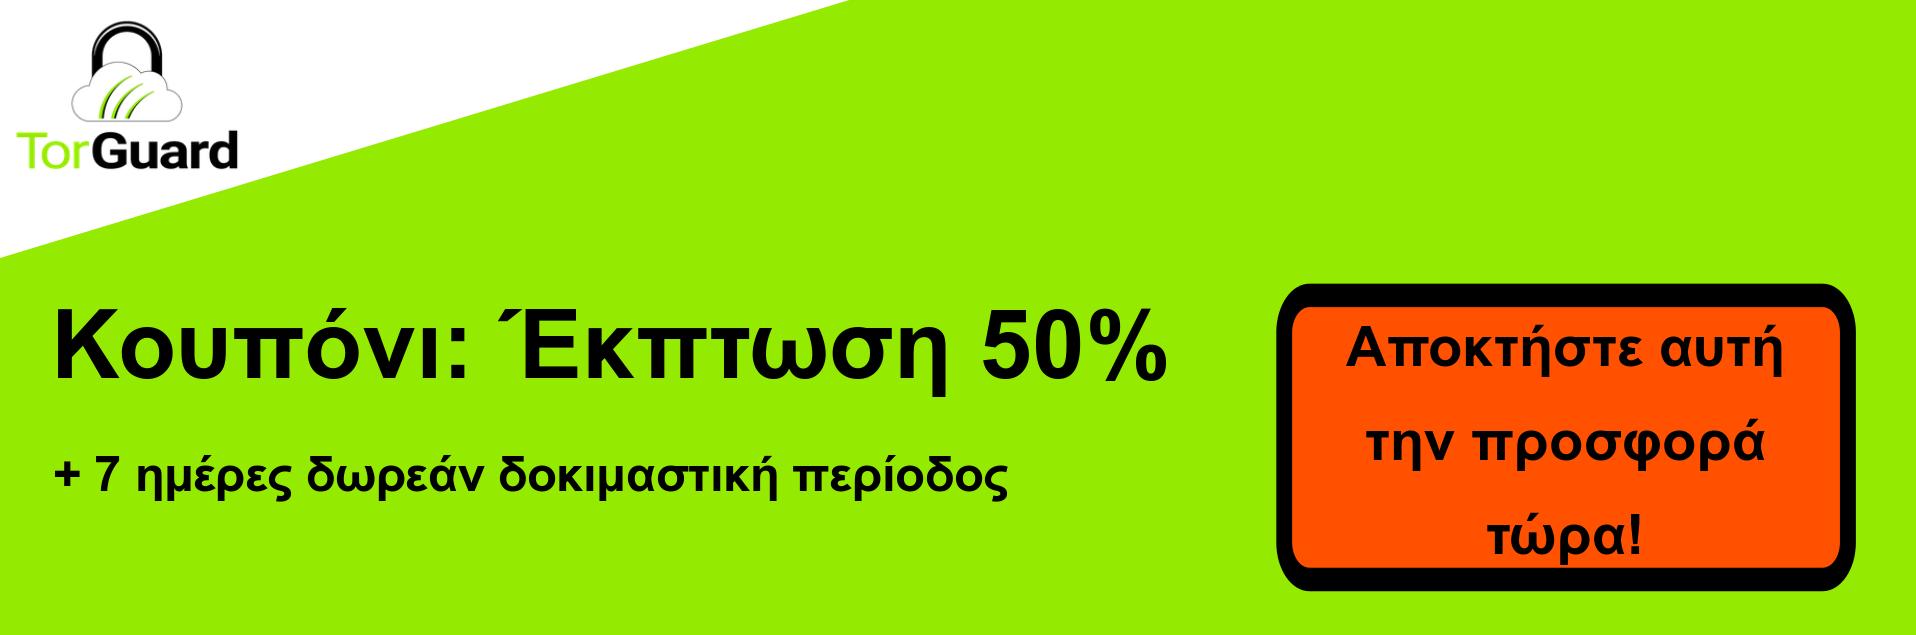 TorGuard VPN κουπόνι banner - έκπτωση 50%